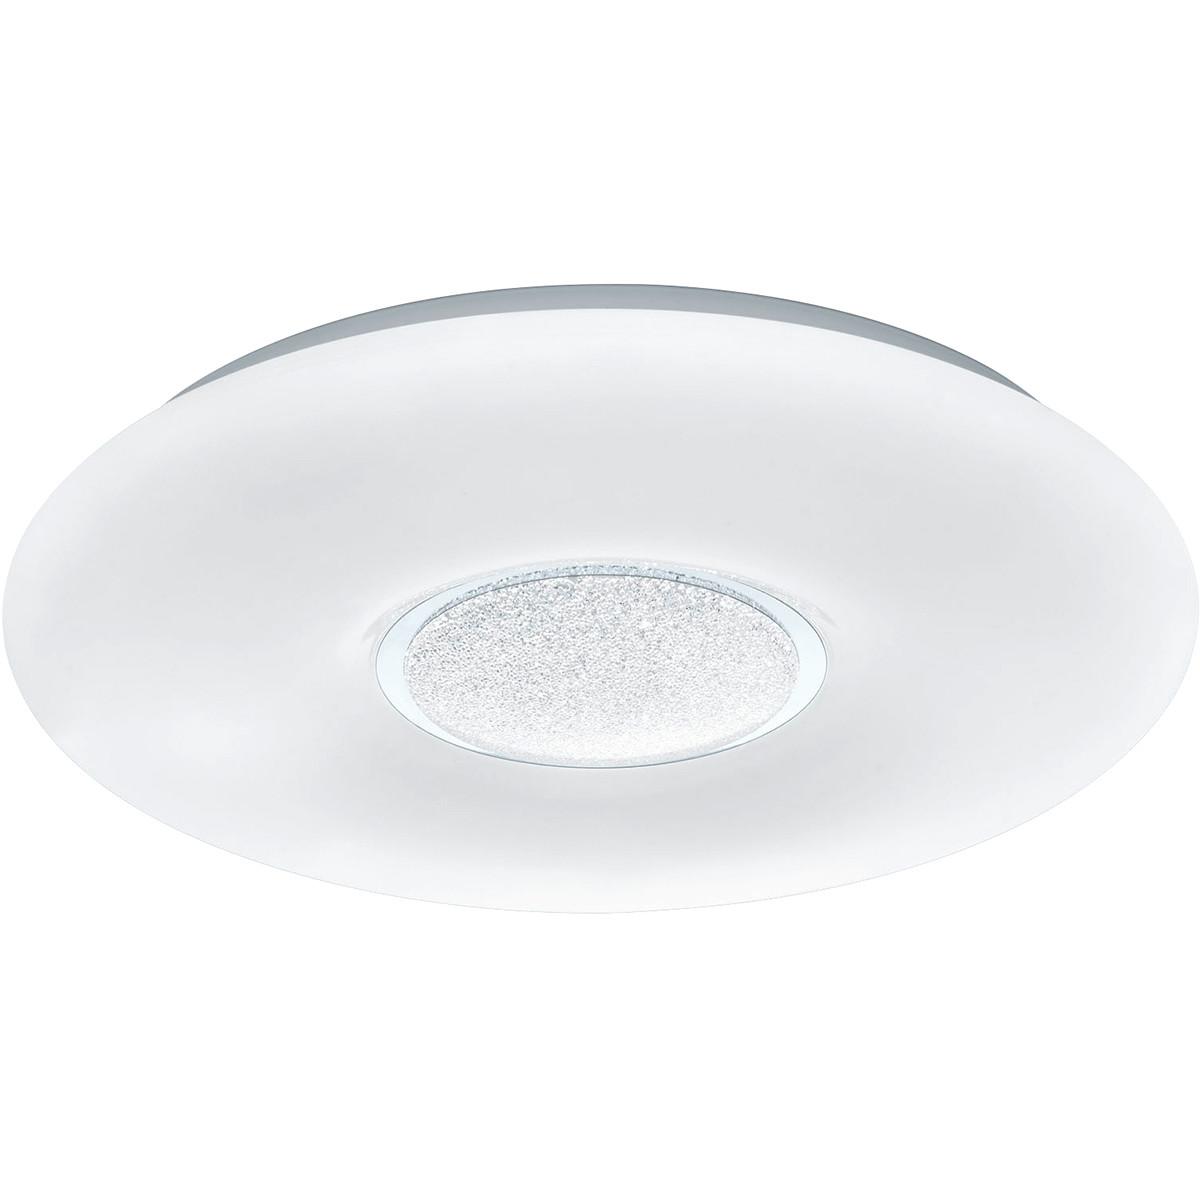 LED Plafondlamp - Trion Ako - 21W - Aanpasbare Kleur - Dimbaar - Afstandsbediening - Rond - Mat Wit